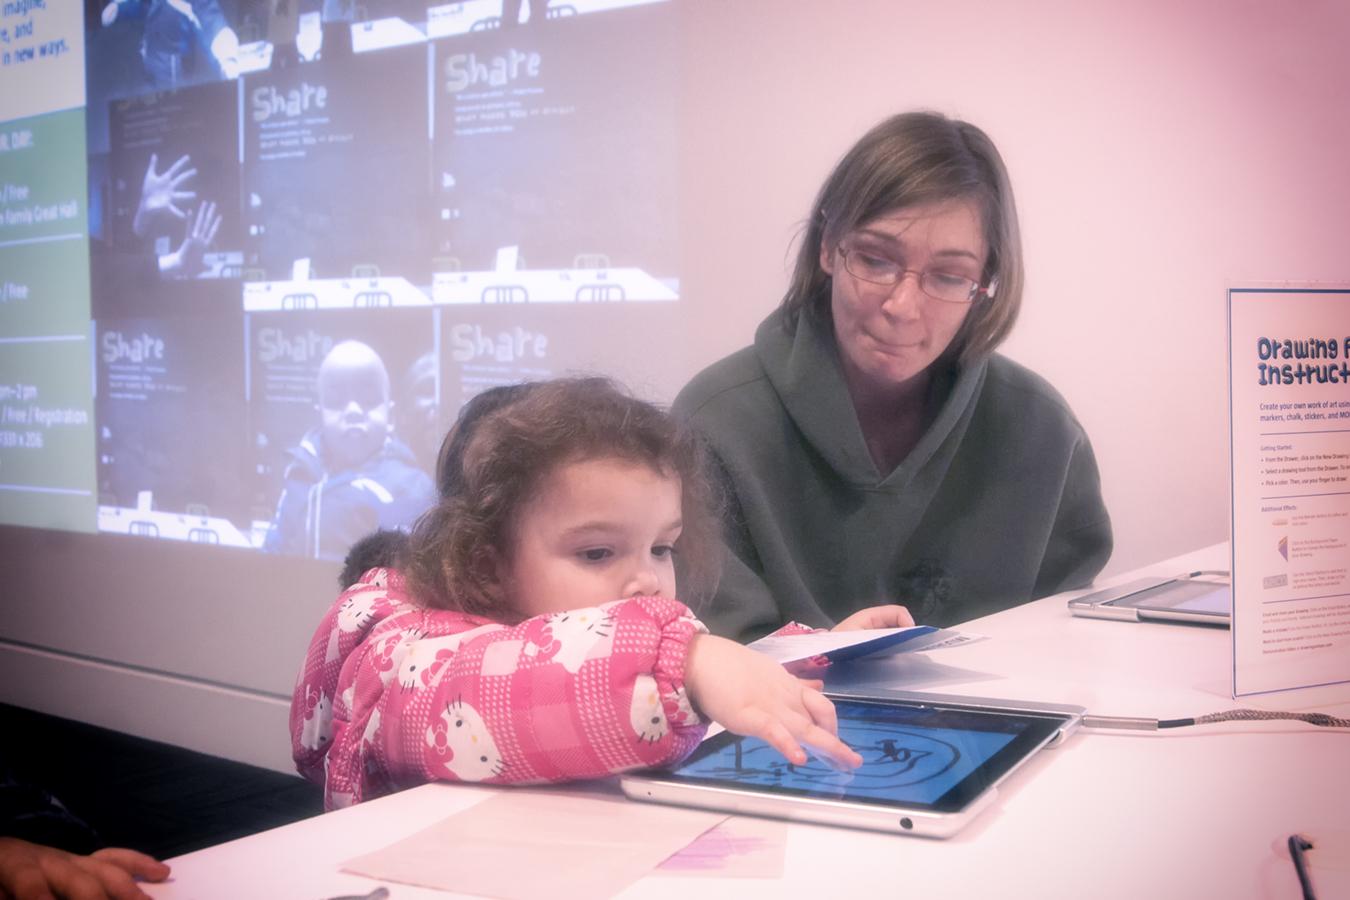 charles i. letbetter - mom versus technology